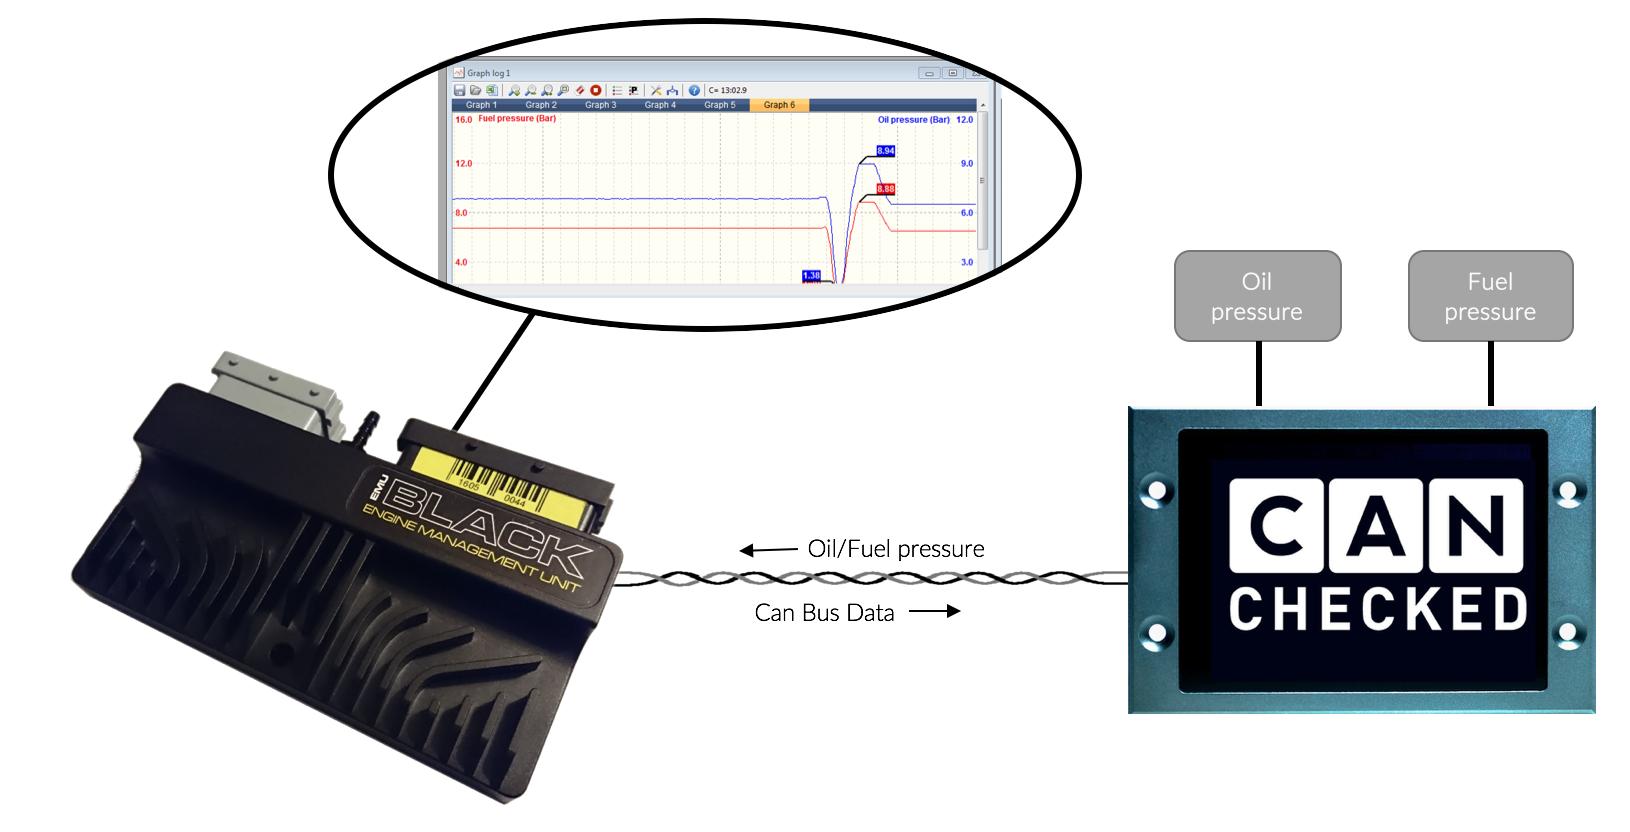 Ecumaster Integration - CAN AN forwarding